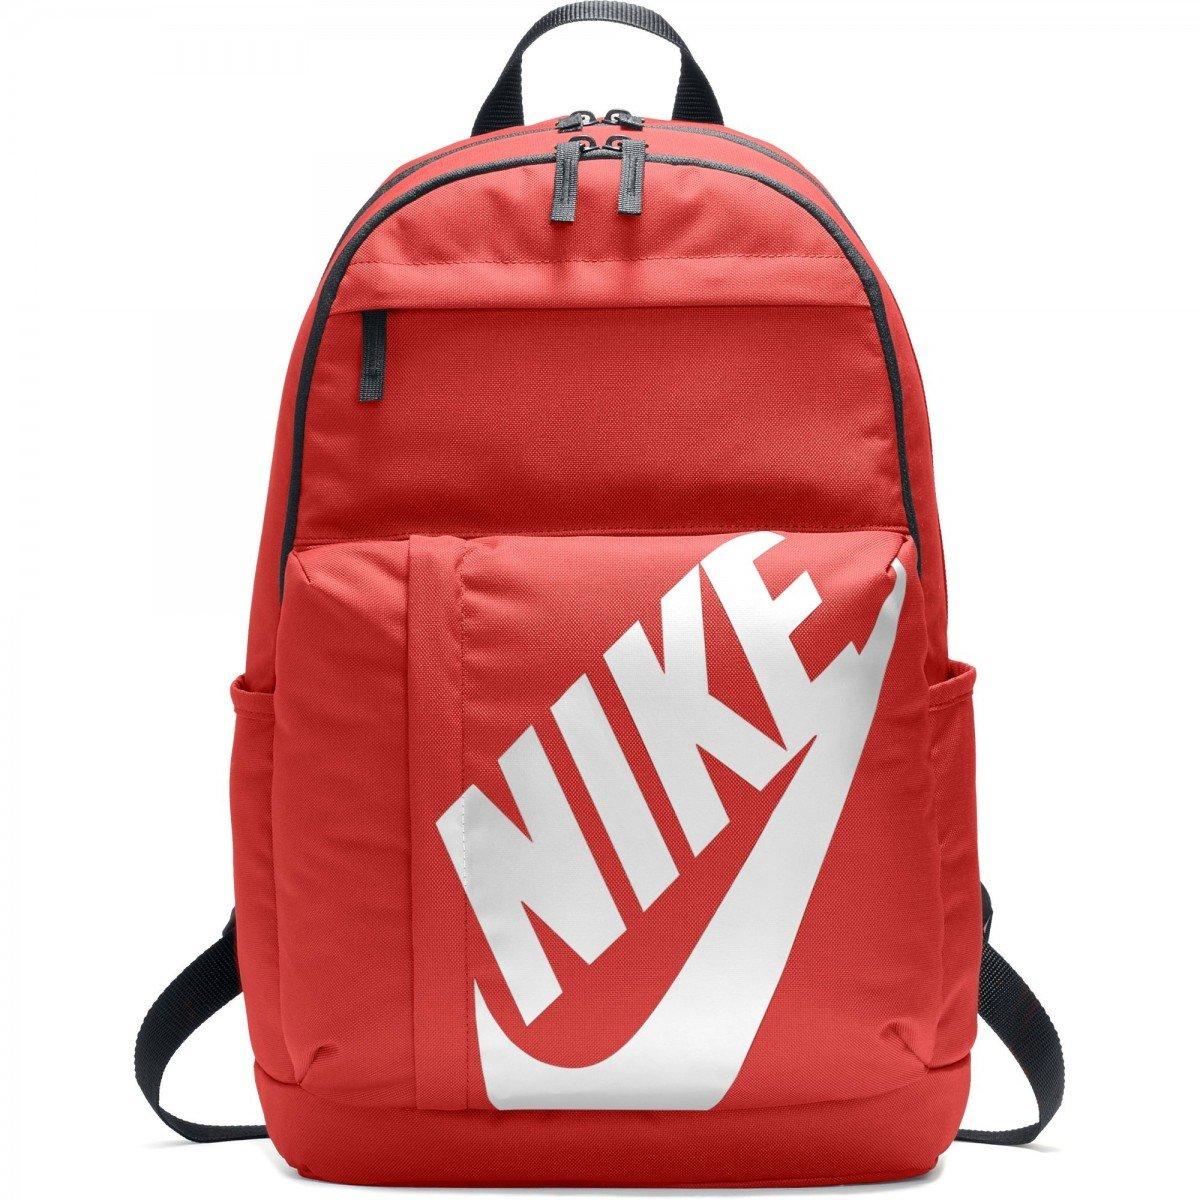 56666b7b9d5db Nike Red Sportswear Elemental Backpack  Amazon.in  Bags